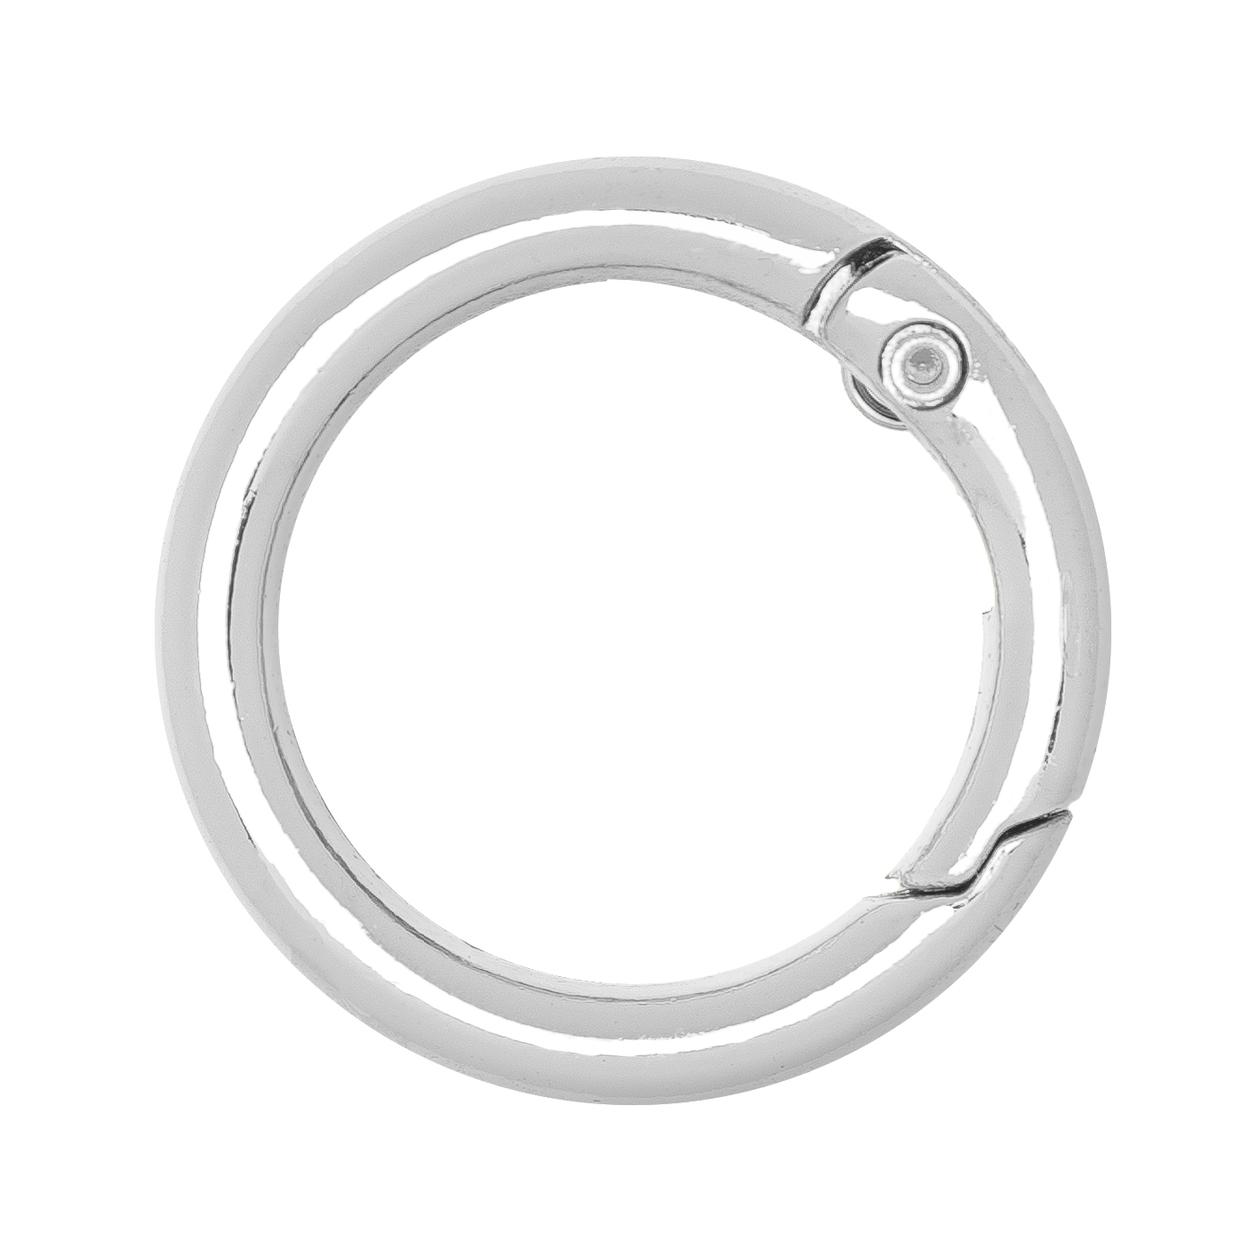 Кольцо разъёмное 25 мм. (никель)